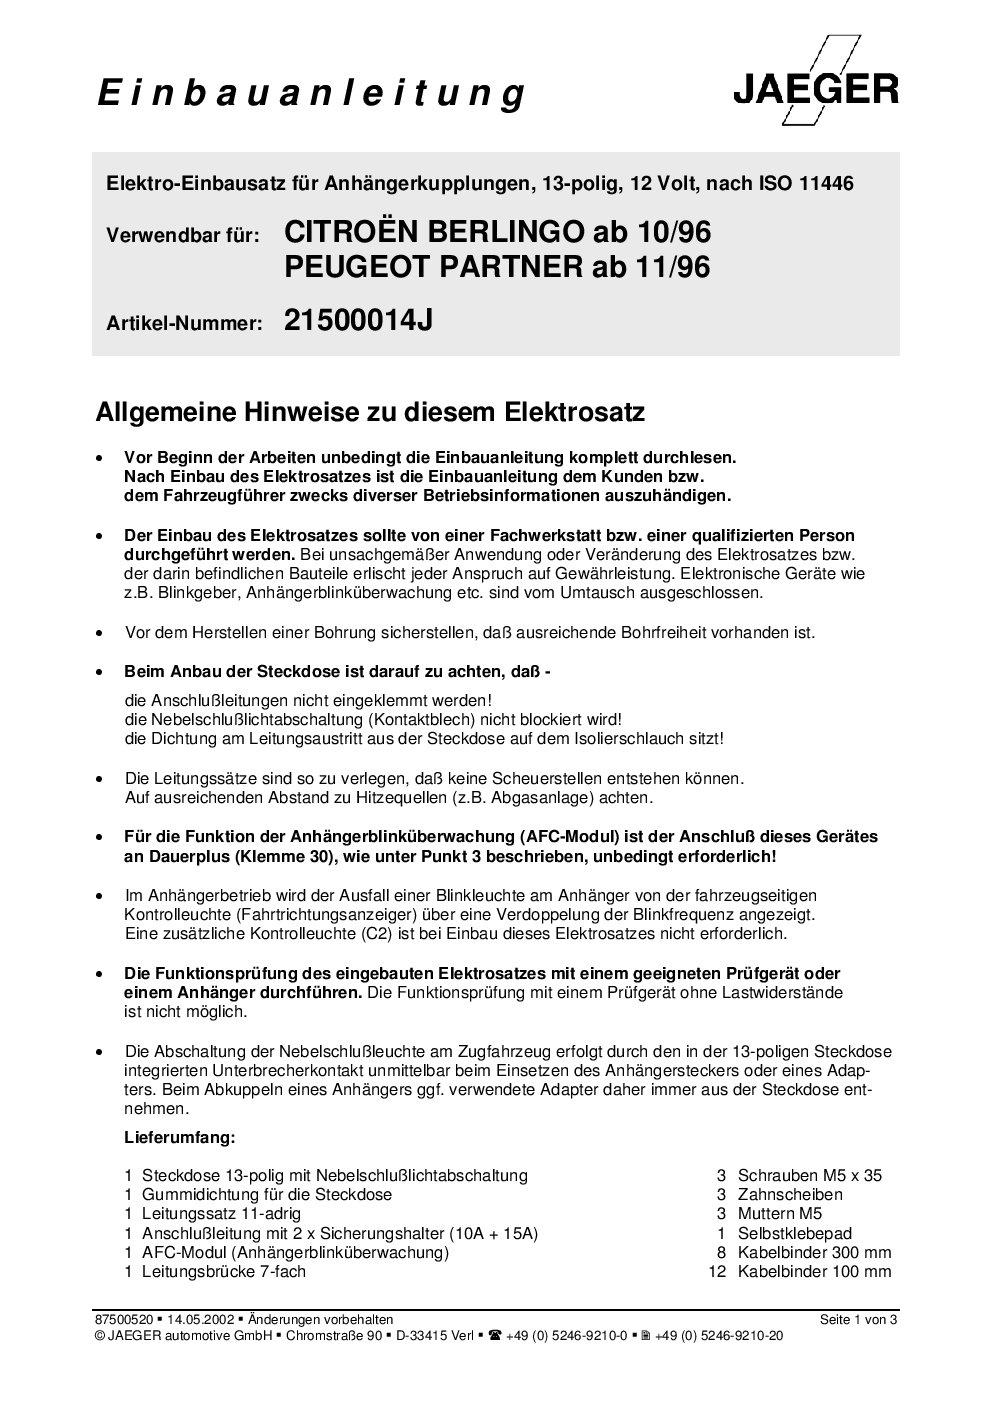 11.2011 ELEKTROSATZ 13-polig SPEZIFISCH Für Citroen Berlingo II ab 06.2008